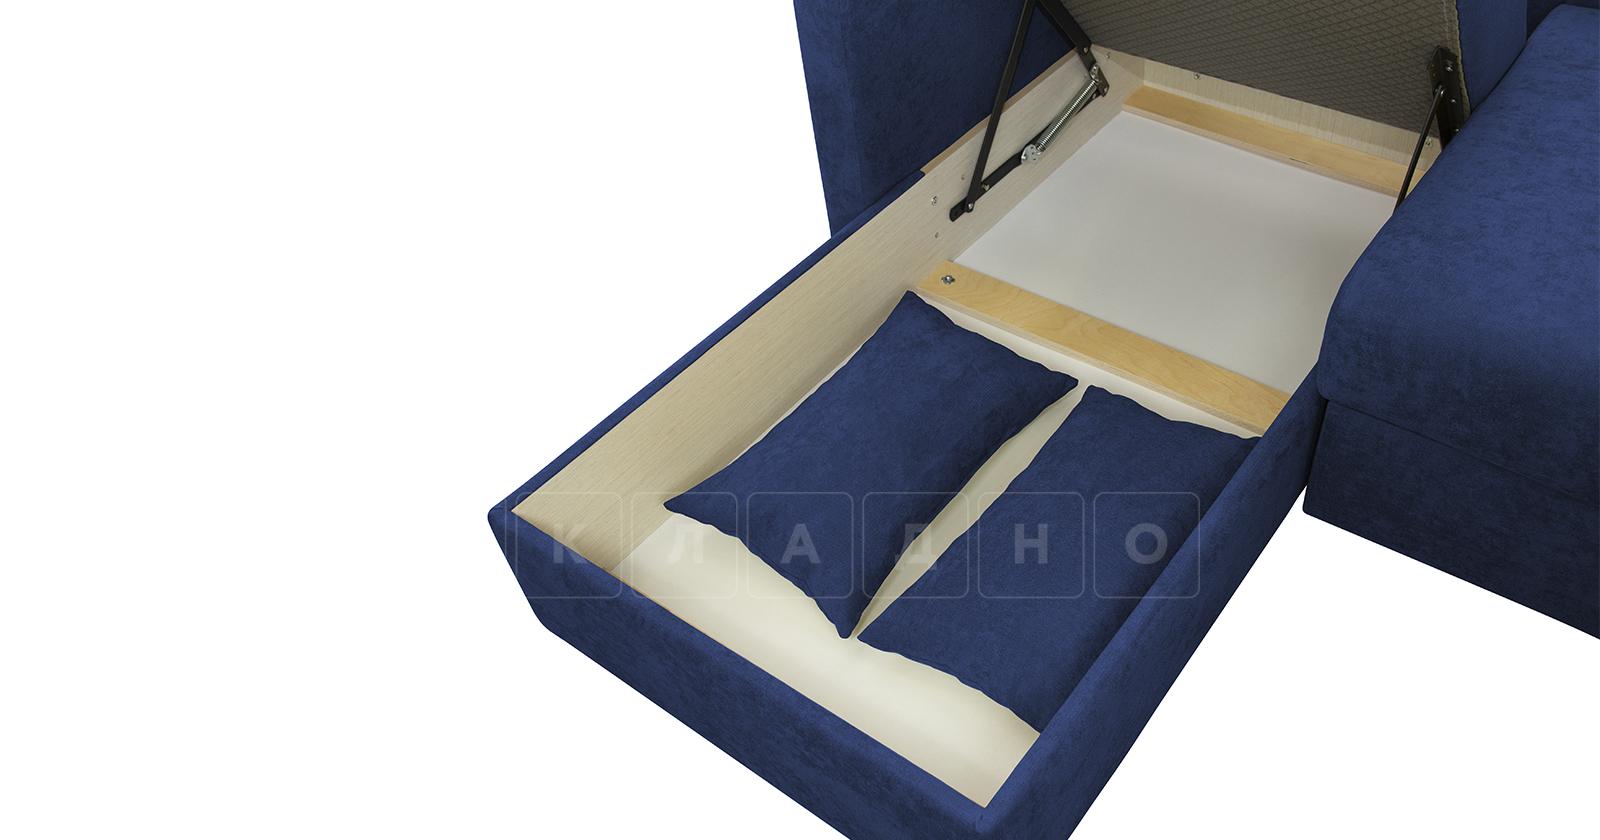 Угловой диван Дарвин темно-синий фото 14 | интернет-магазин Складно